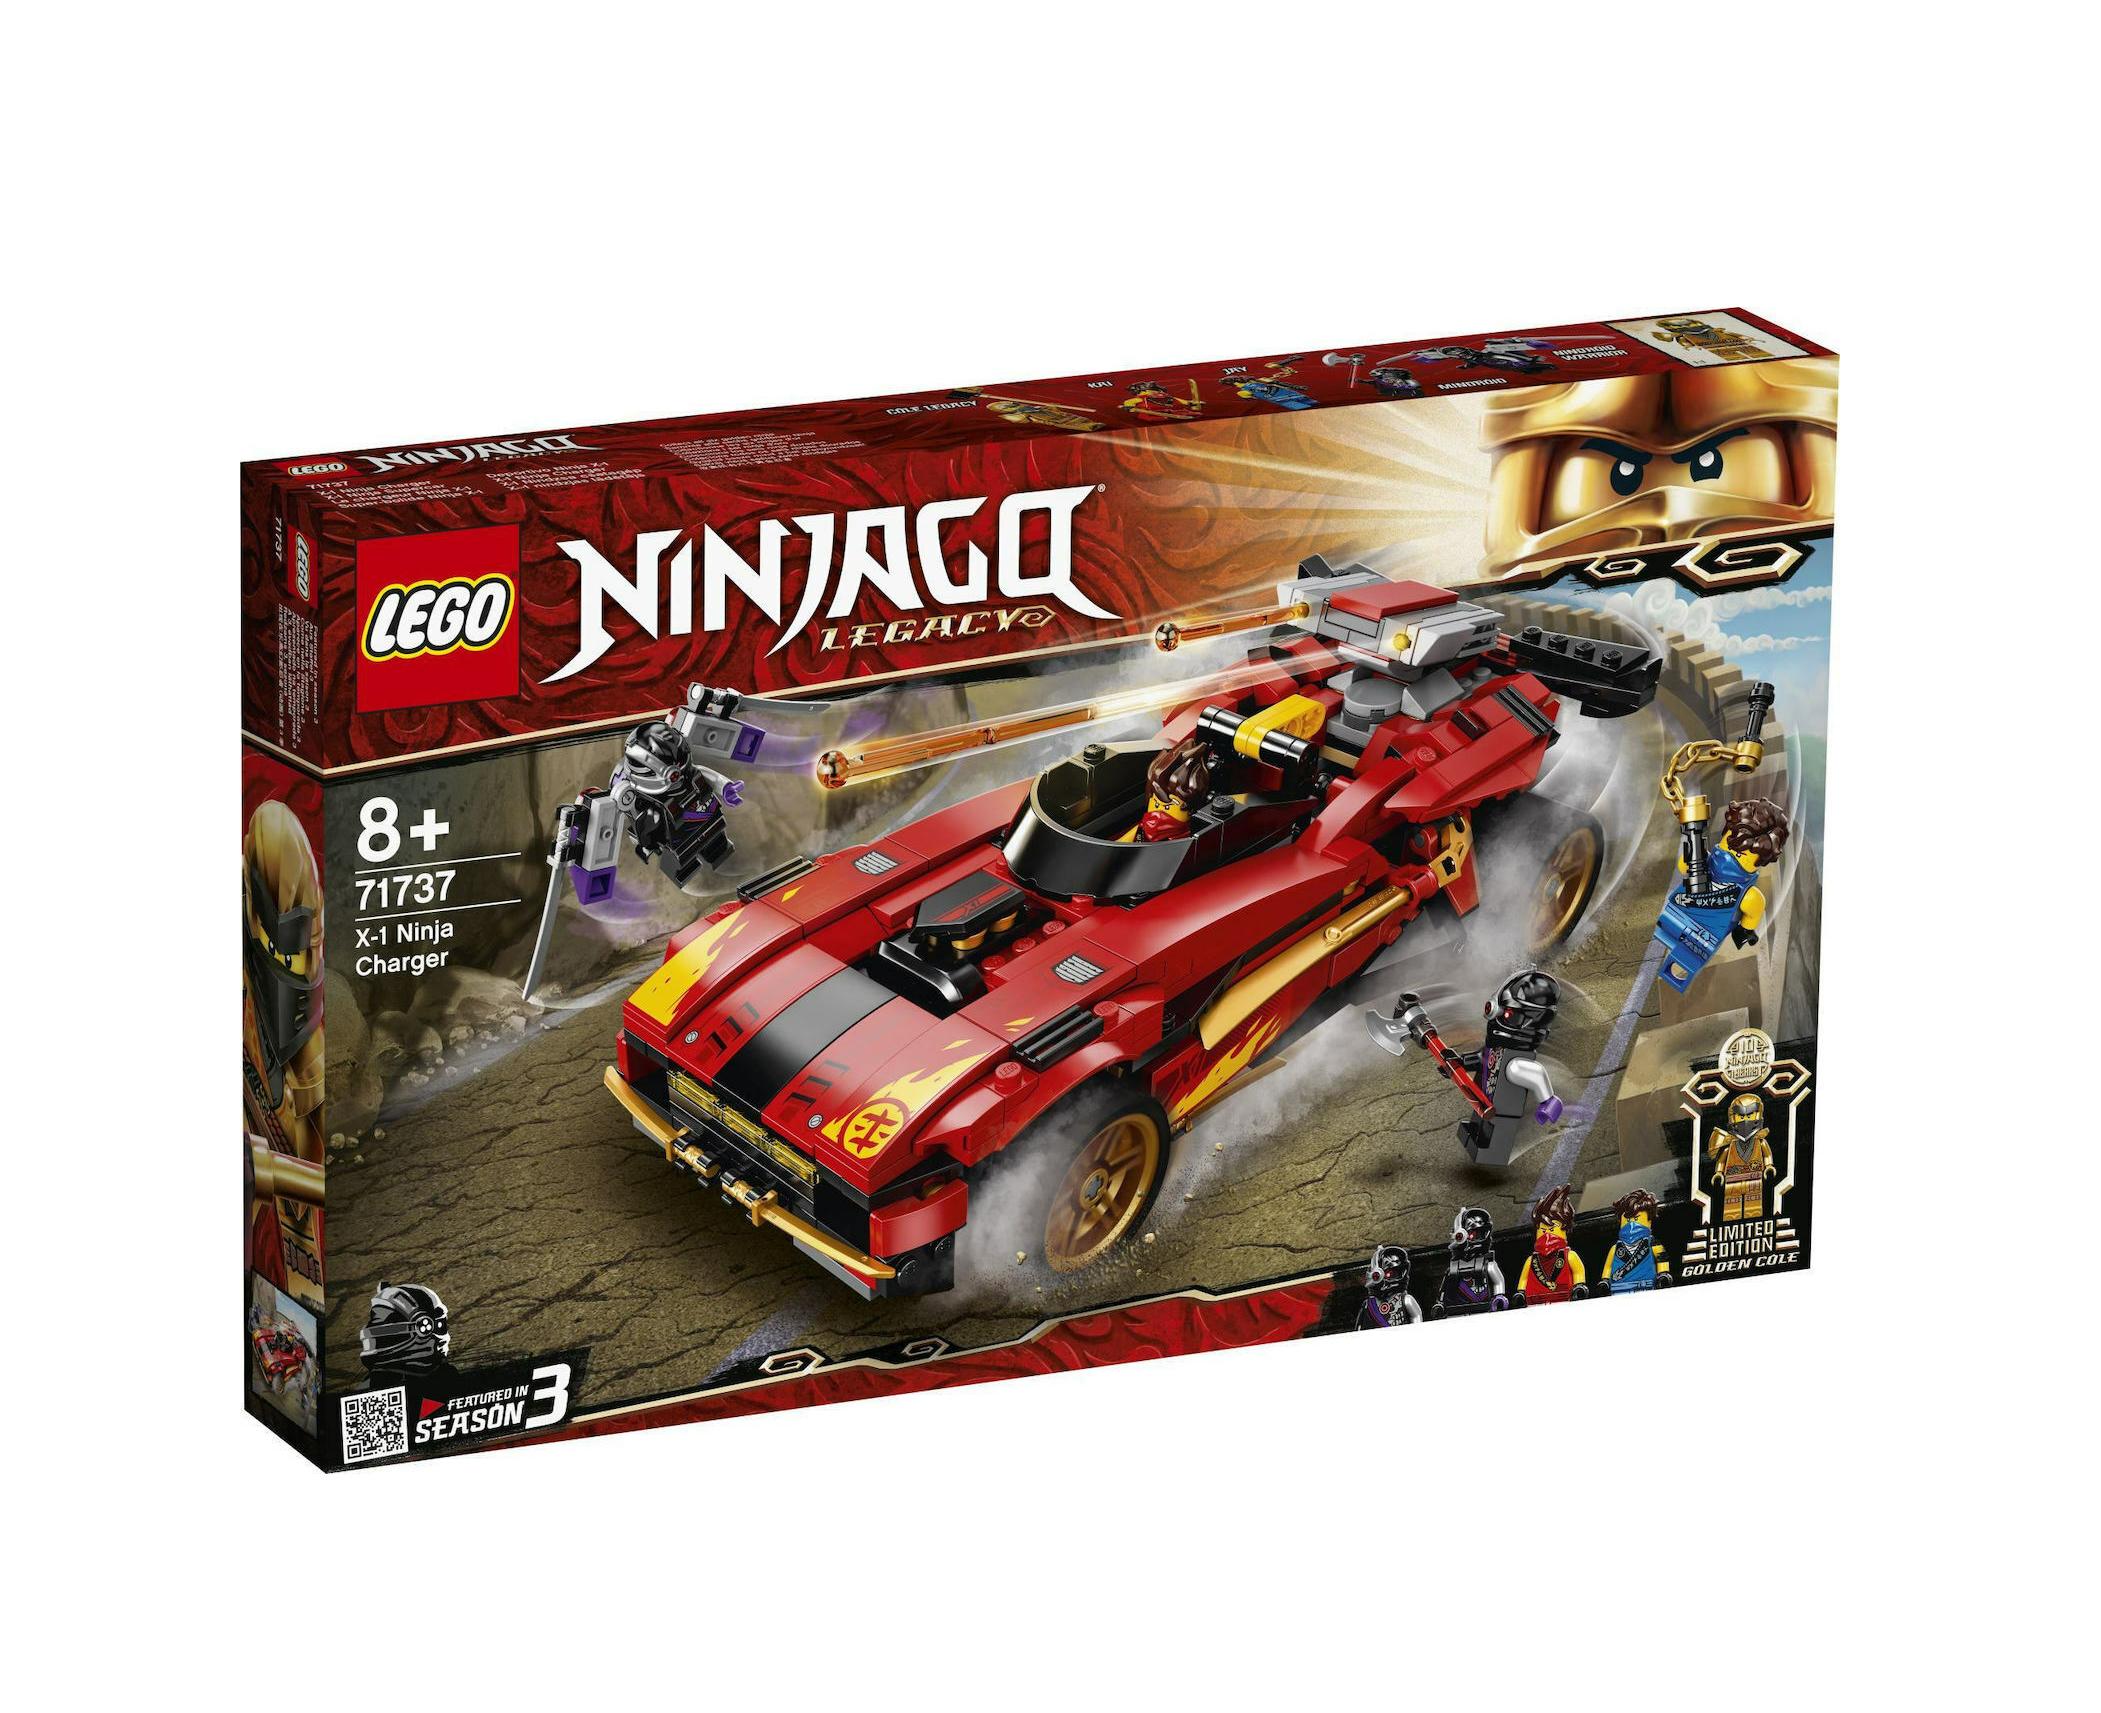 Lego Ninjago: Legacy X-1 Ninja Charger Ninja 71737